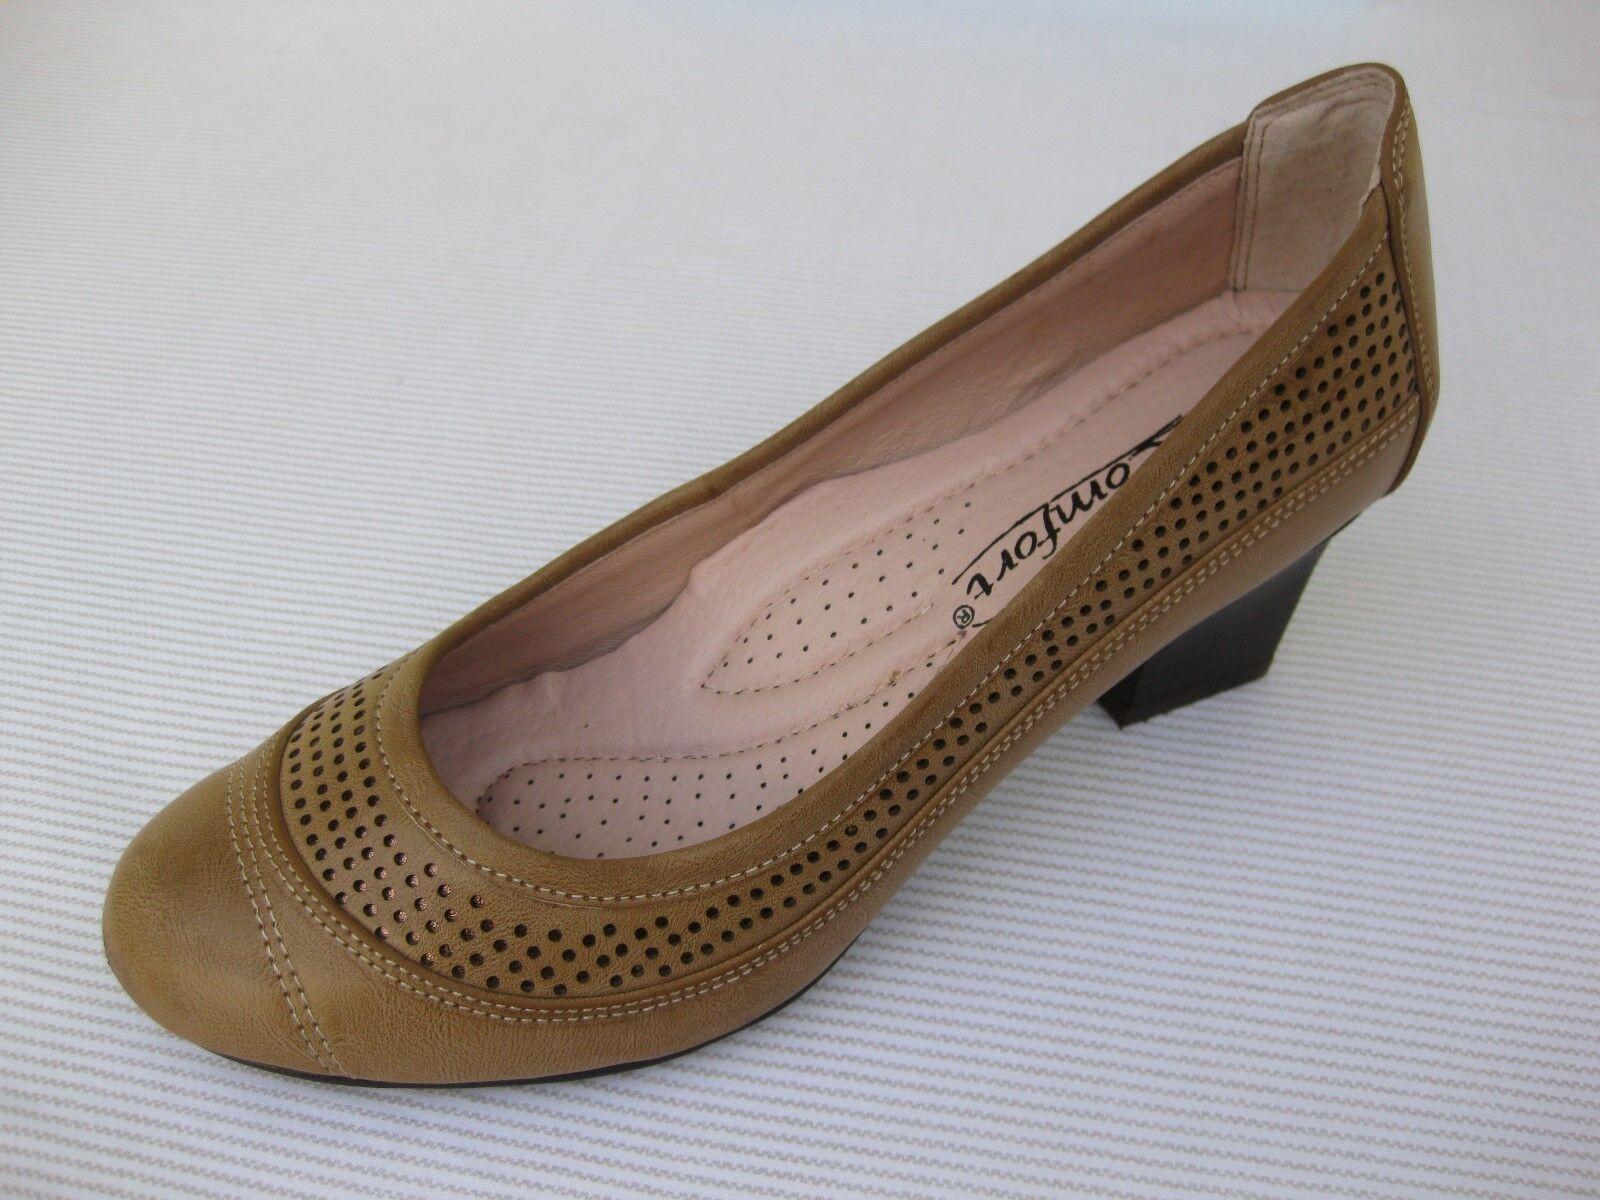 Le Comfort Womens Sand Shoes NEW $58 Betta Sand Womens Tan Perfed Pump 9 M f0dbf0